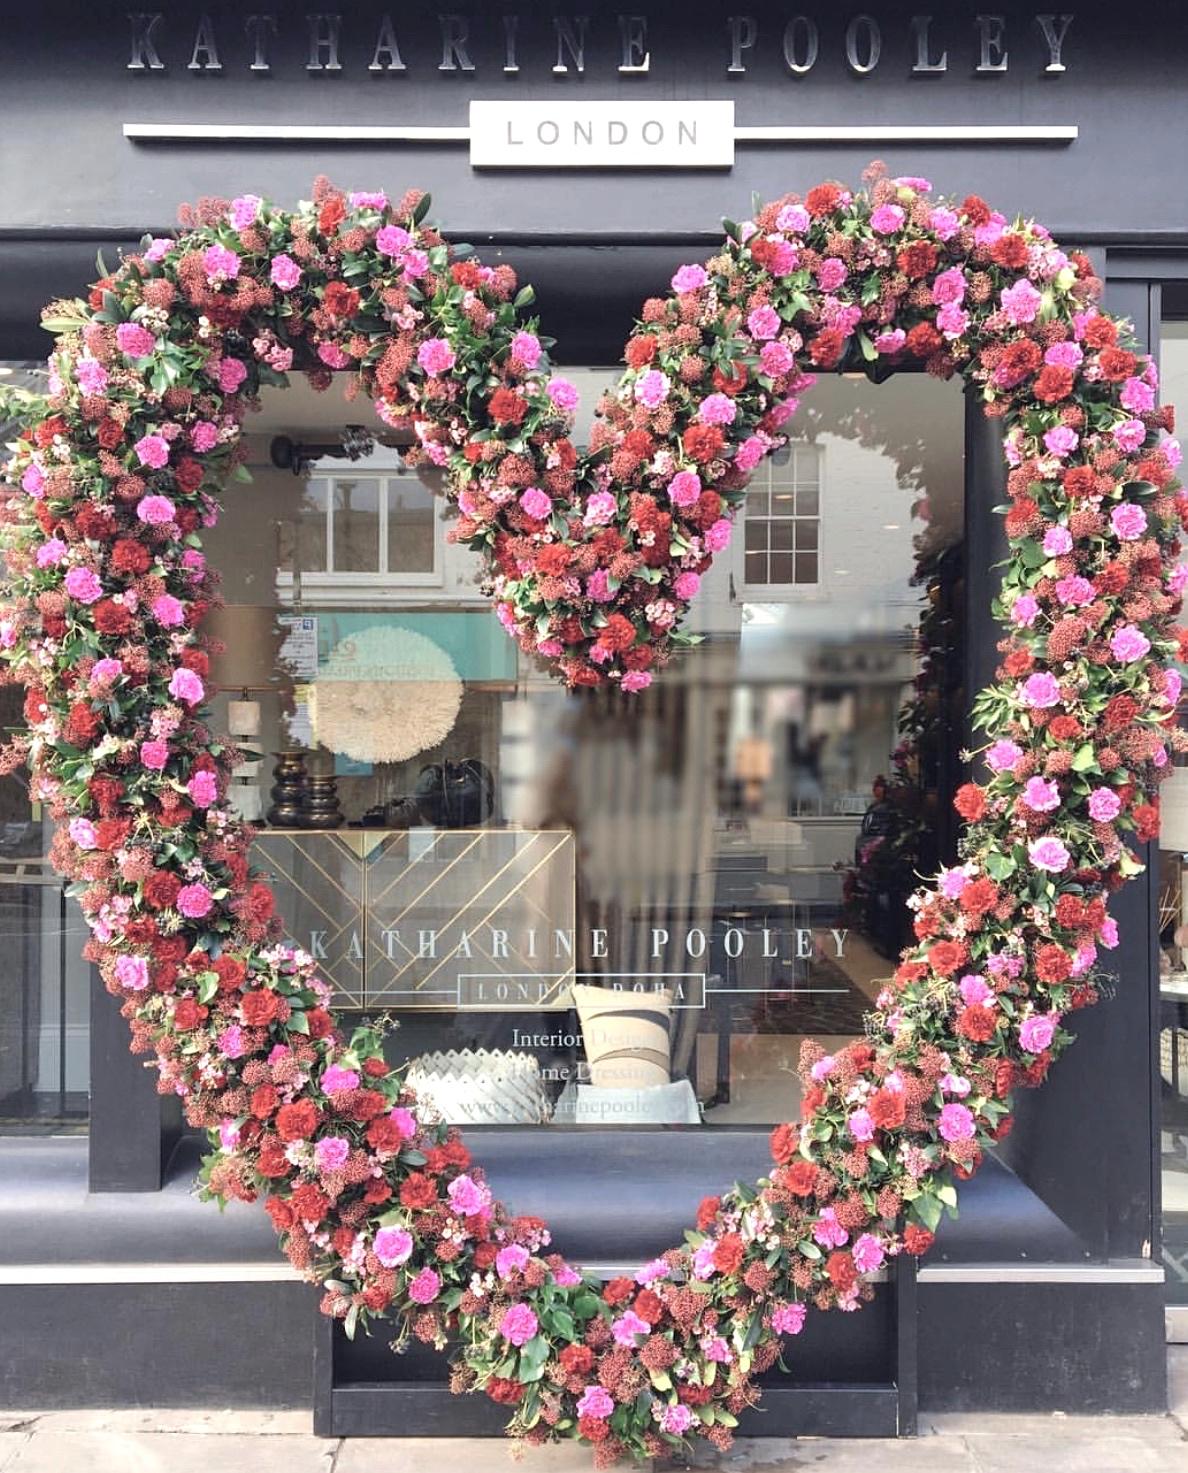 Floral+Heart+Katherine+Pooley%2C+London.jpg